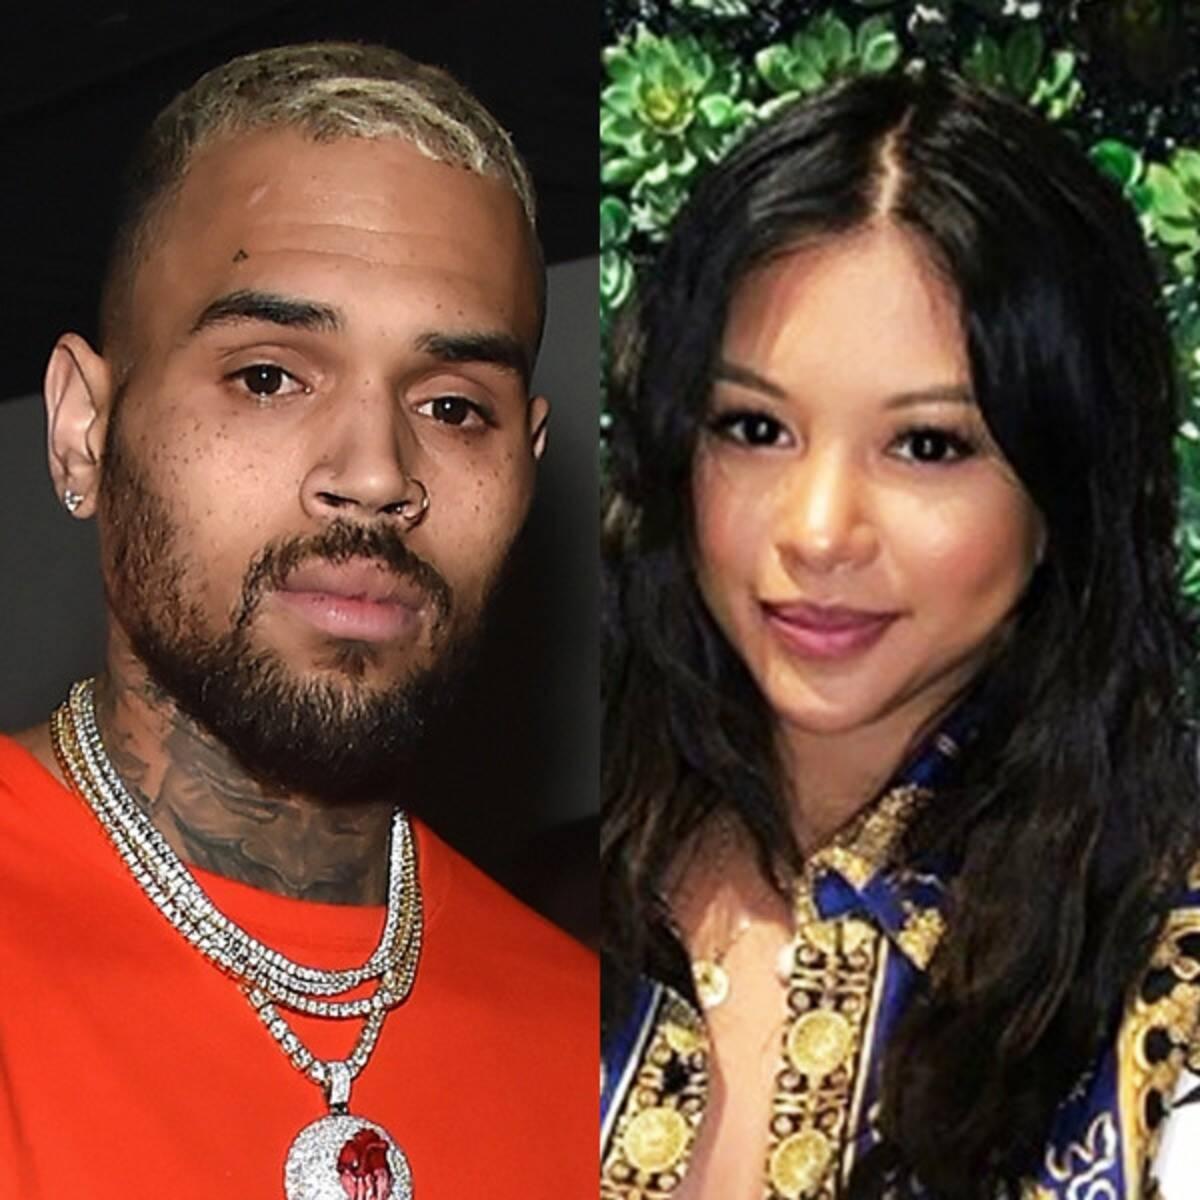 Chris Brown And Ammika Harris Got Secretly Married? - Here